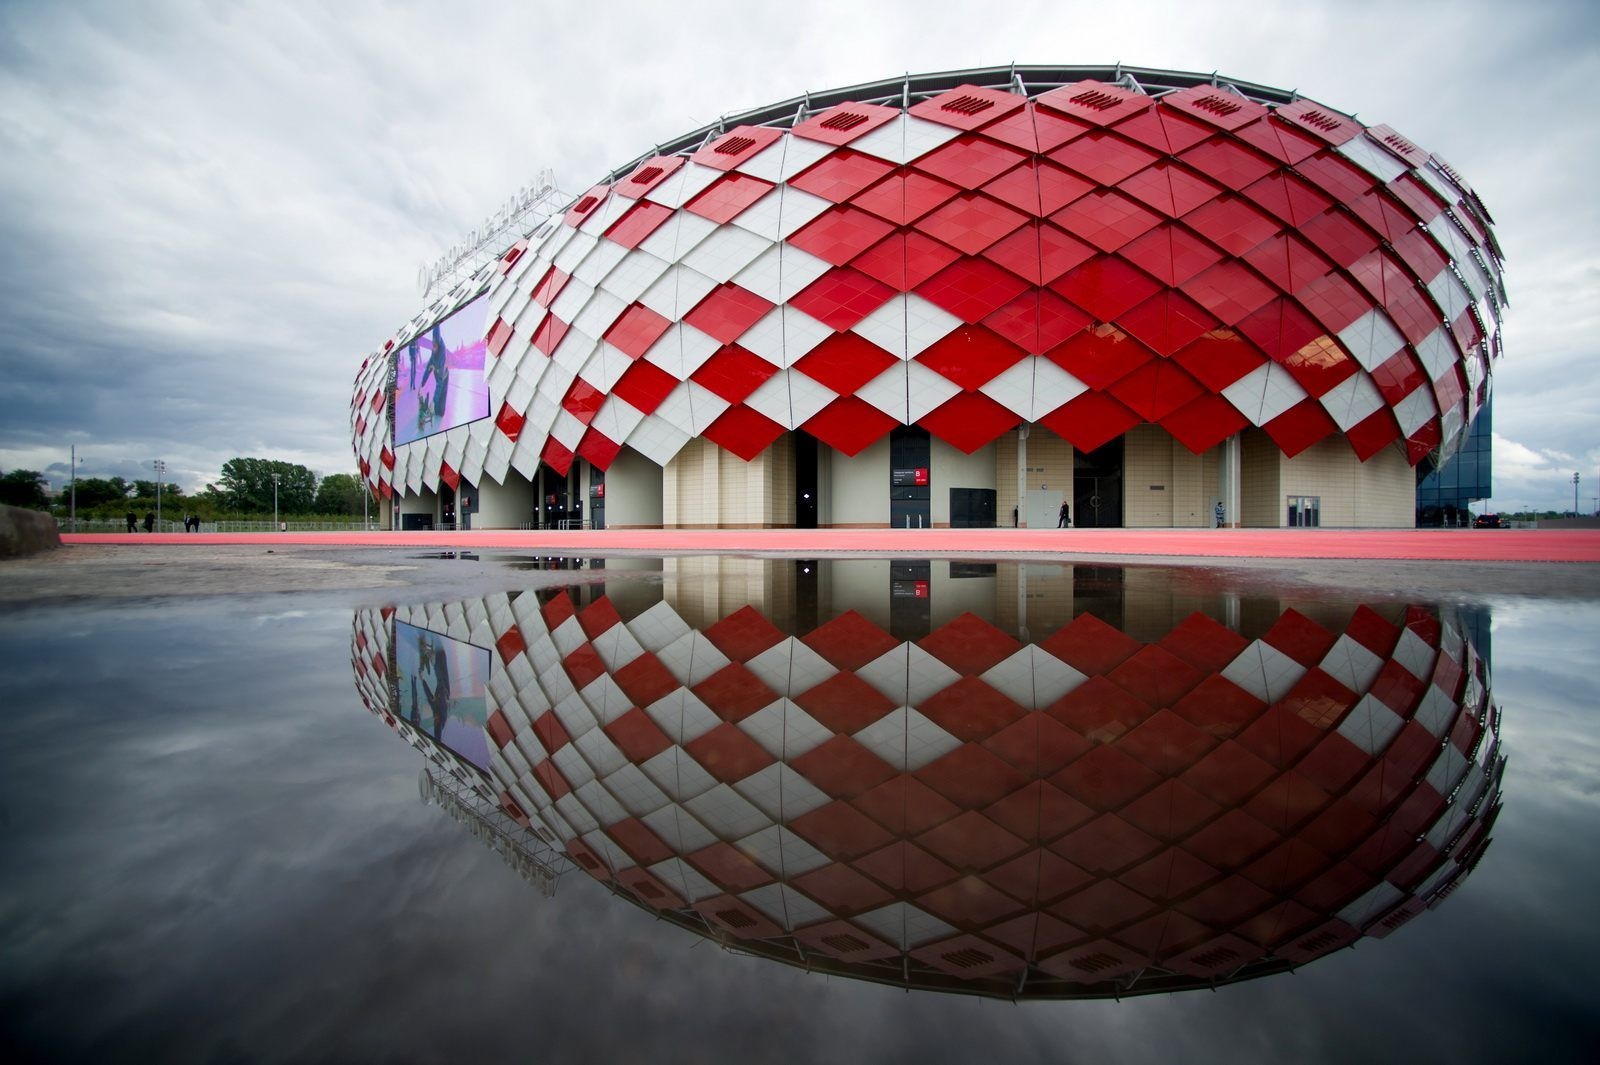 Otkritie Arena Capacity 45 000 5,630 + 48